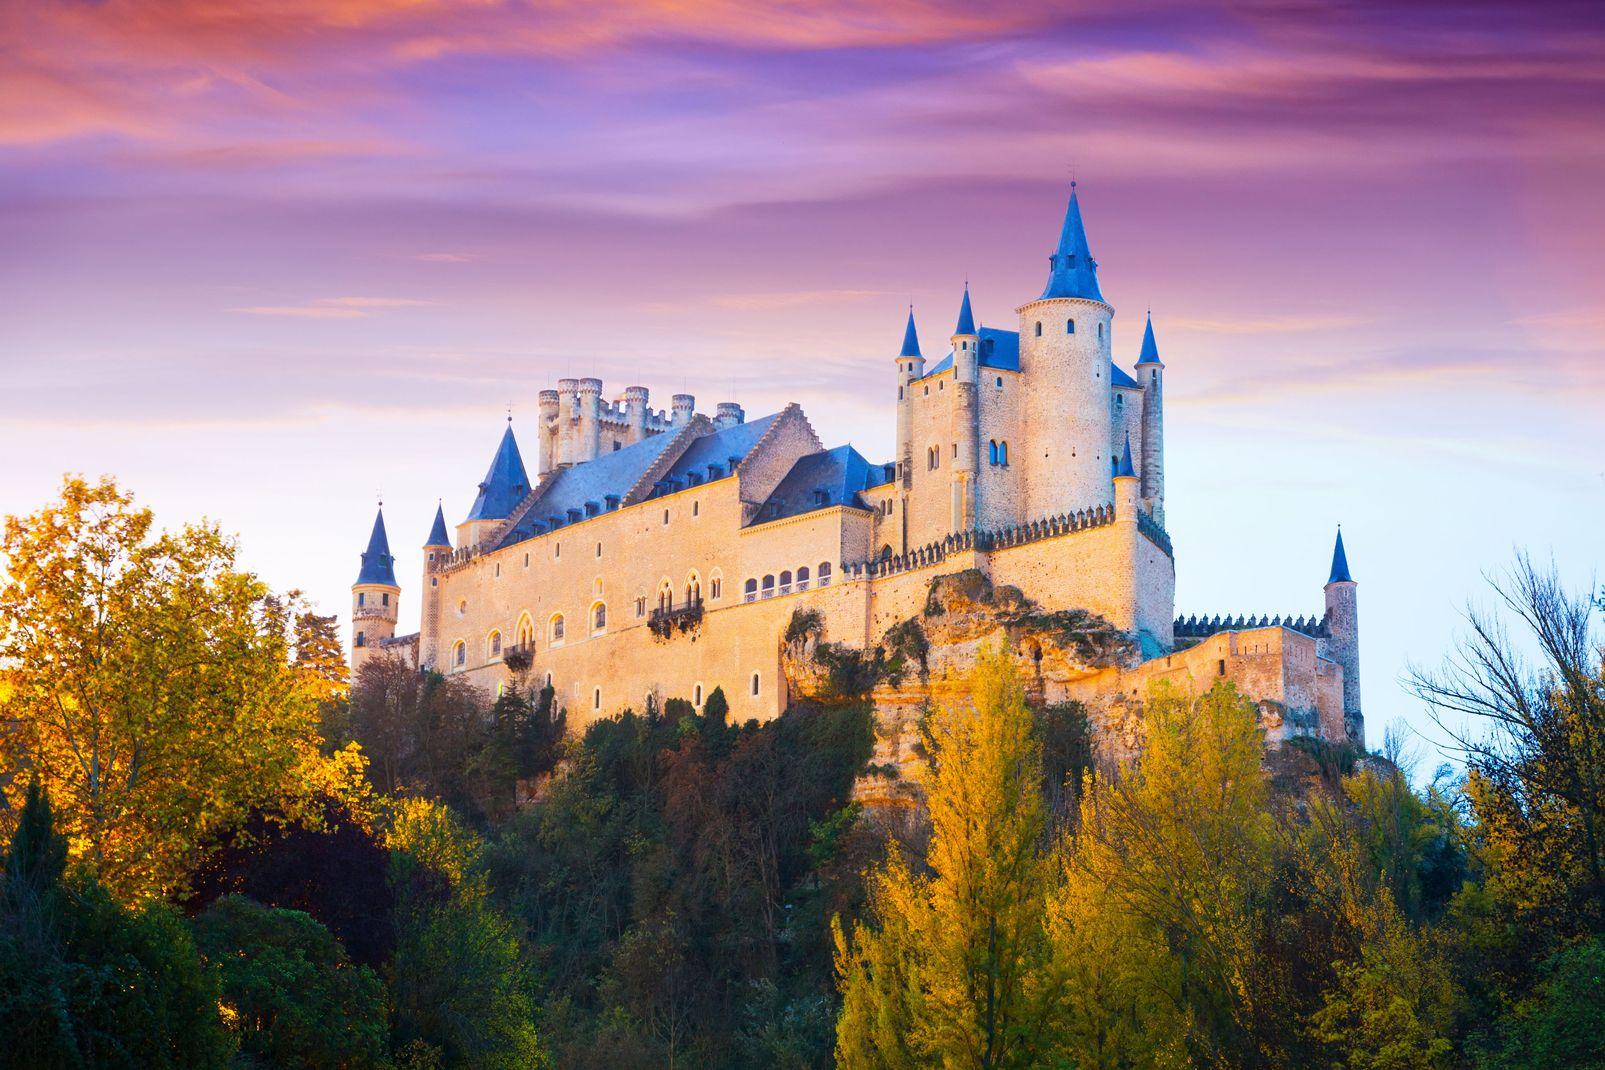 Castile and Leon, Spain